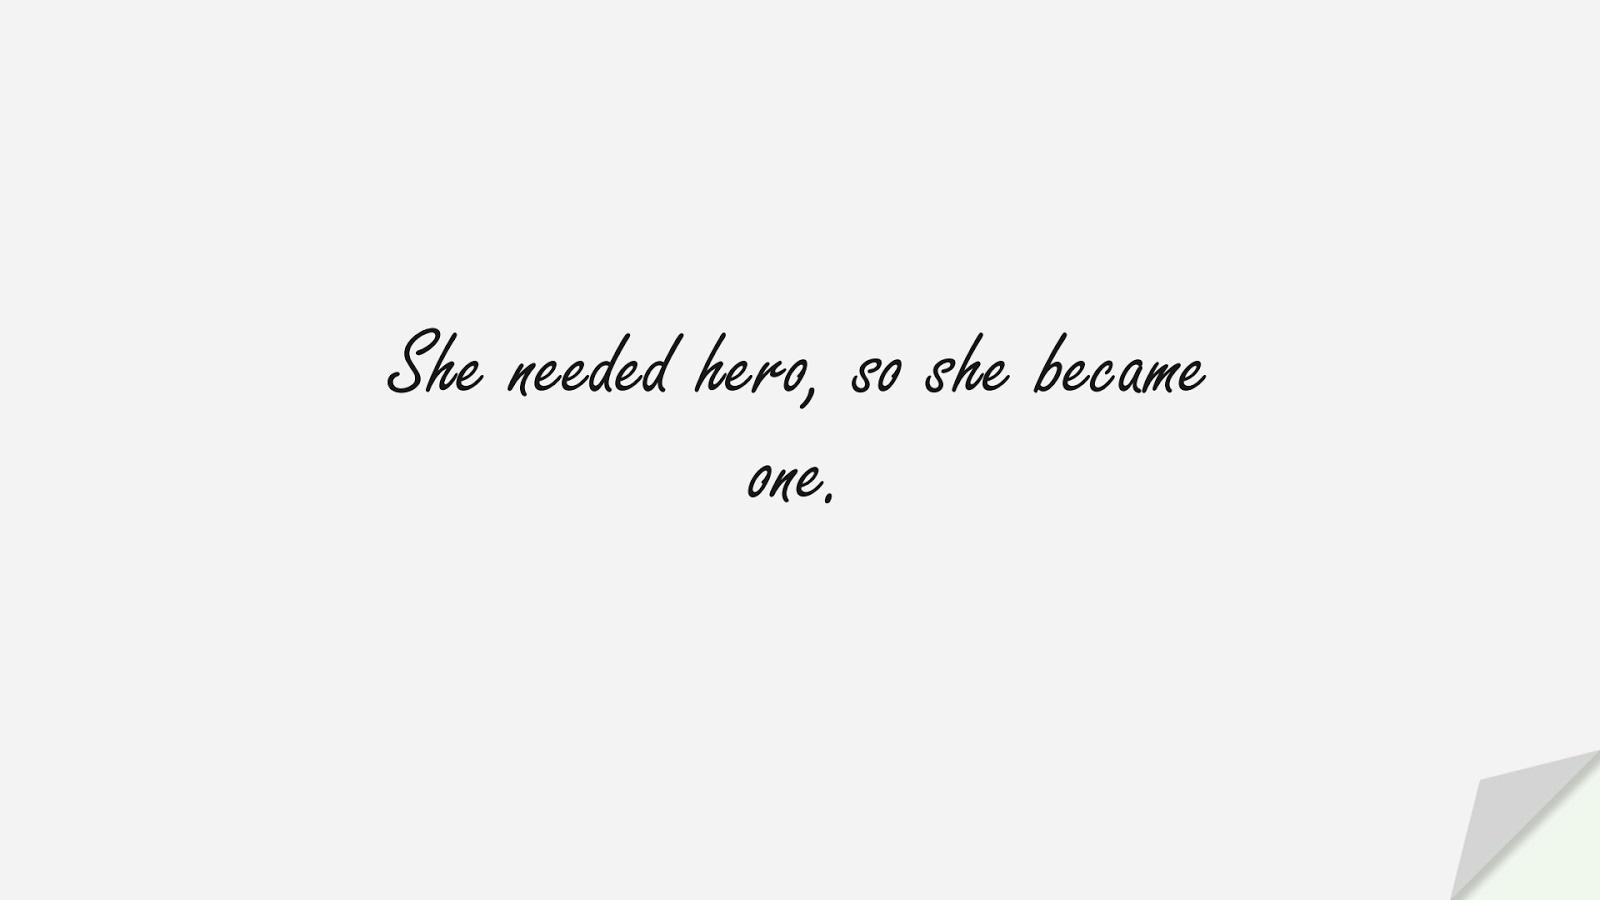 She needed hero, so she became one.FALSE